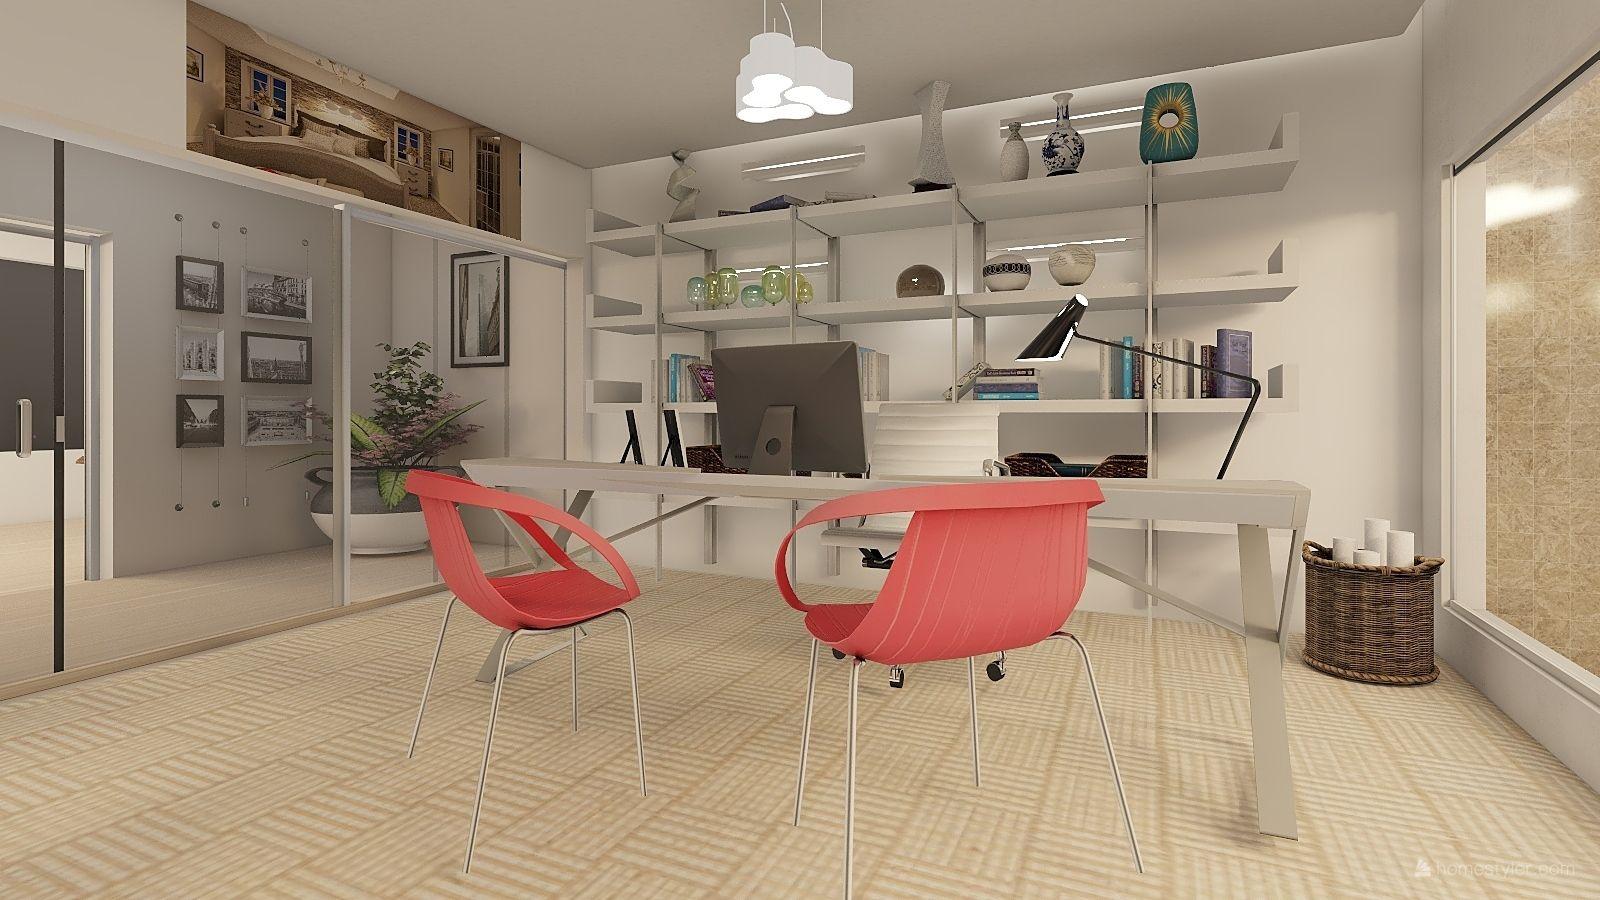 Office Decor By Teke Tin Tekes Home Design Software 3d Home Design Software 3d Home Design